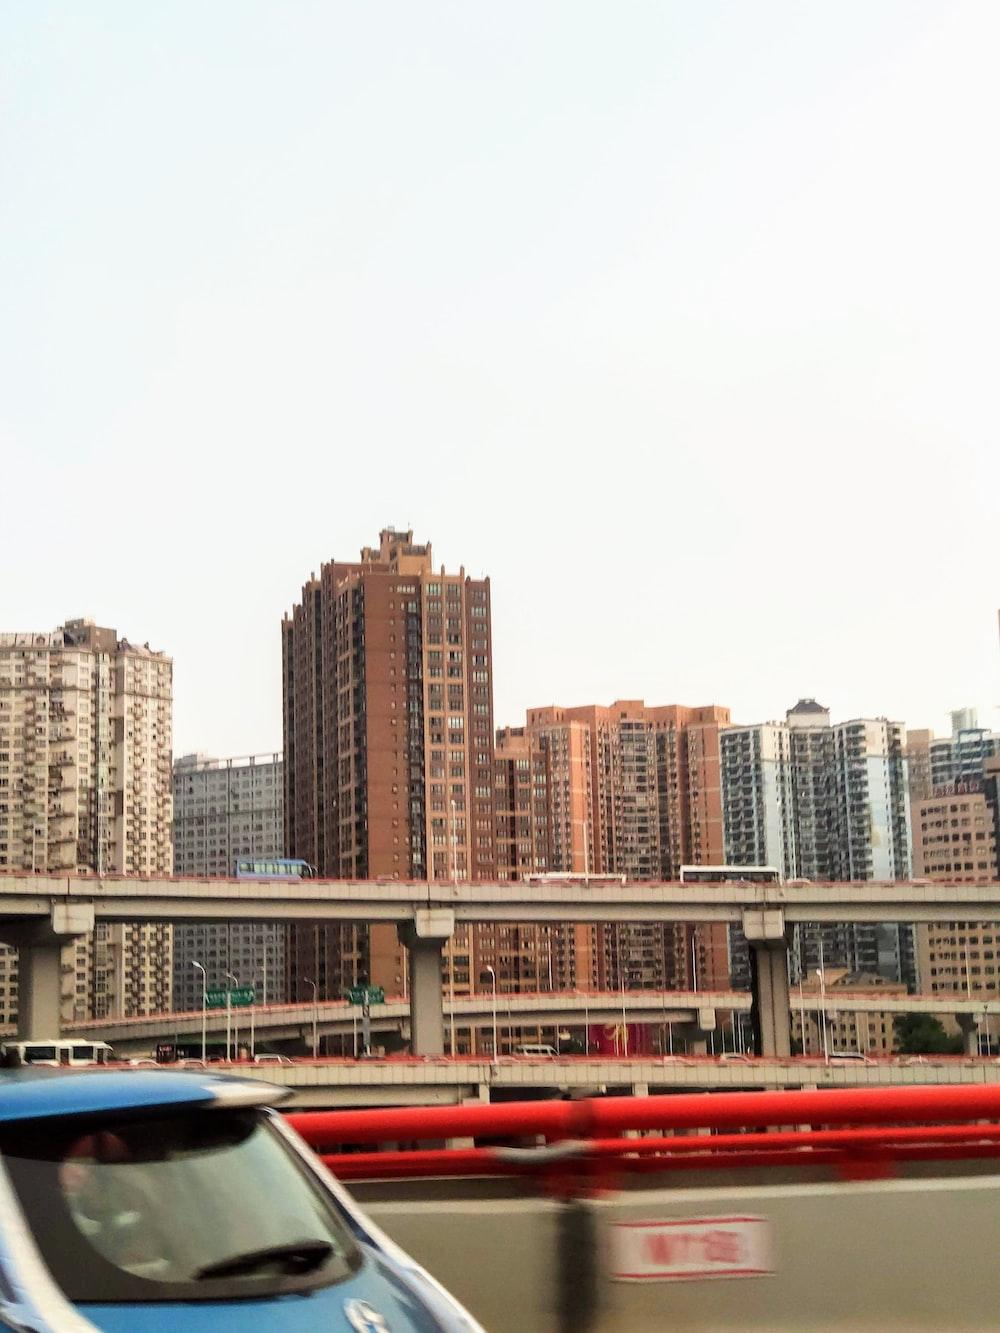 buildings under white sky